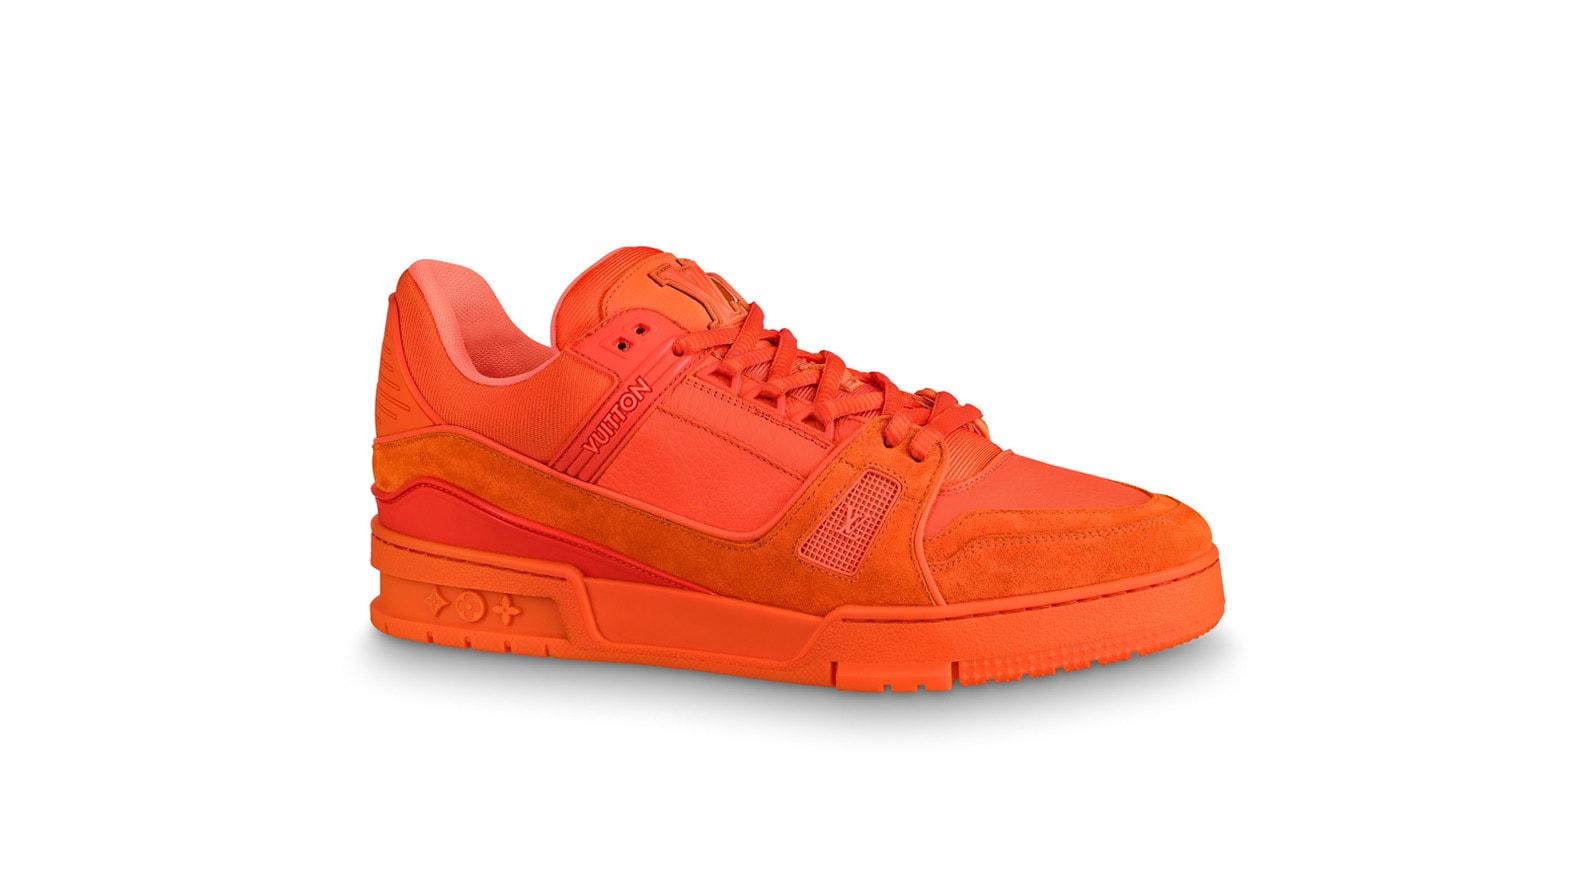 co Nike Auf Ratenkauf Freshwrx Schuhe Klarna – UVLqpMSGz